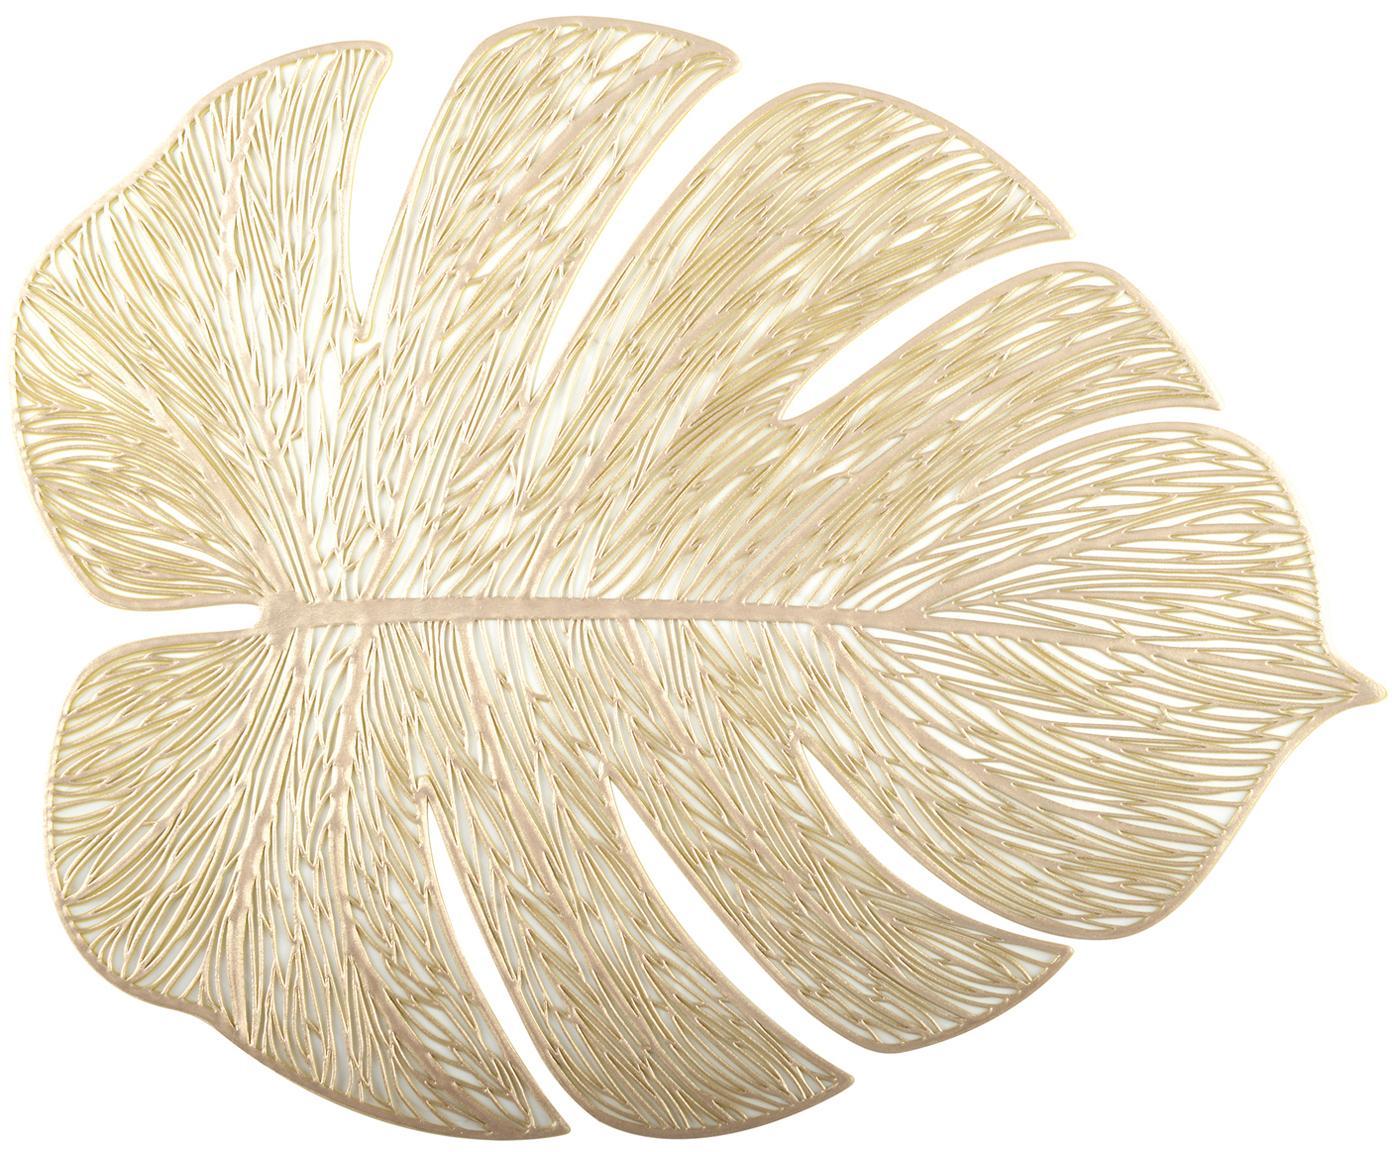 Goldene Tischsets Leaf in Blattform, 2 Stück, Kunststoff, Goldfarben, 33 x 40 cm